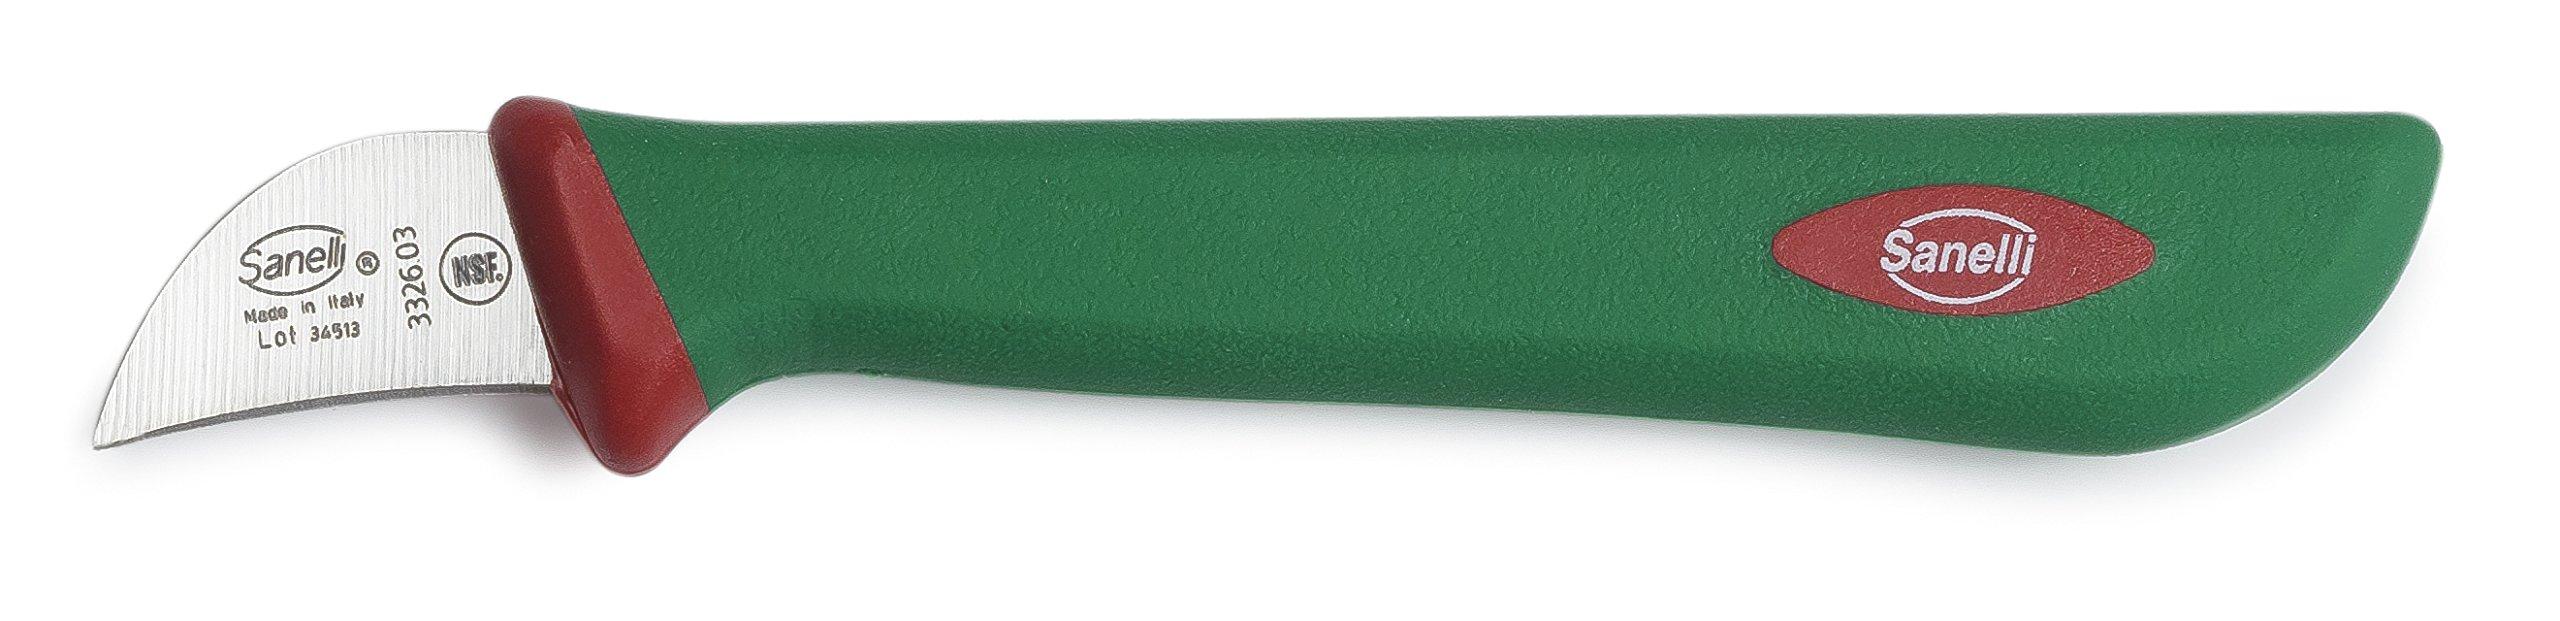 Sanelli Premana Professional Chestnuts Knife, 3cm/1.18'', Green